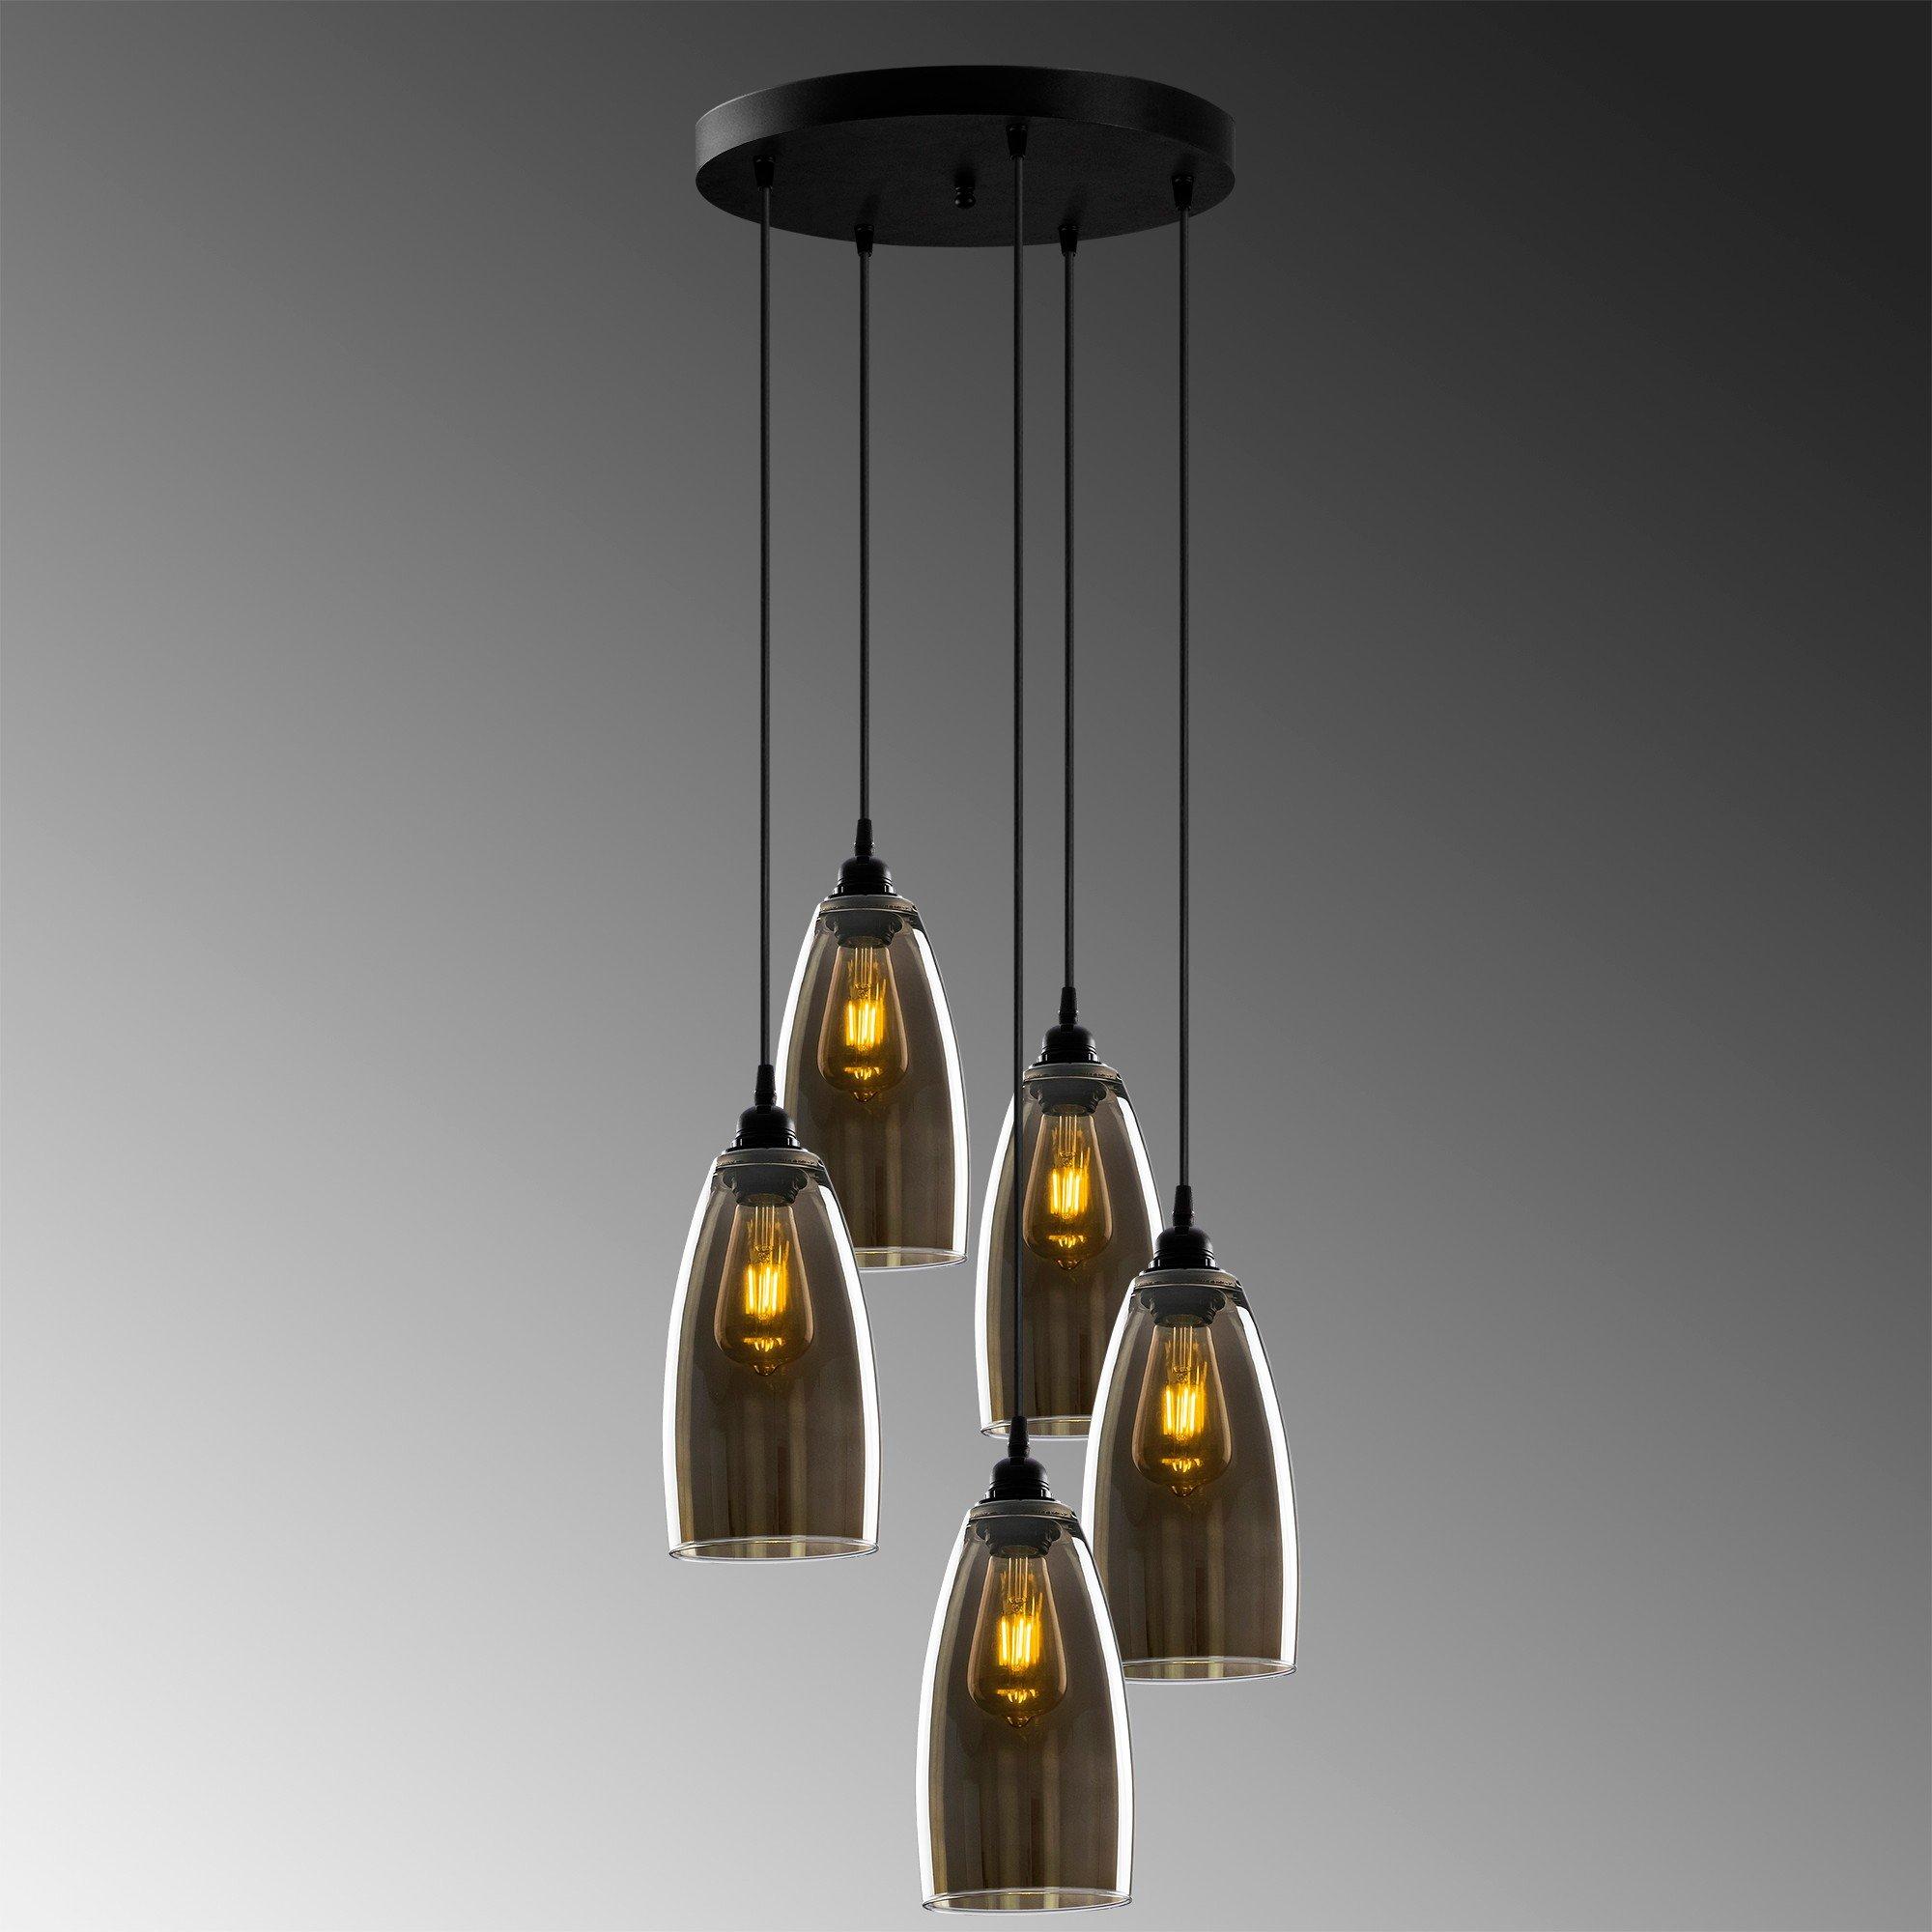 Hanglamp smoked glass donker langwerpig 5 keer een E27 fitting - grijze achtergrond